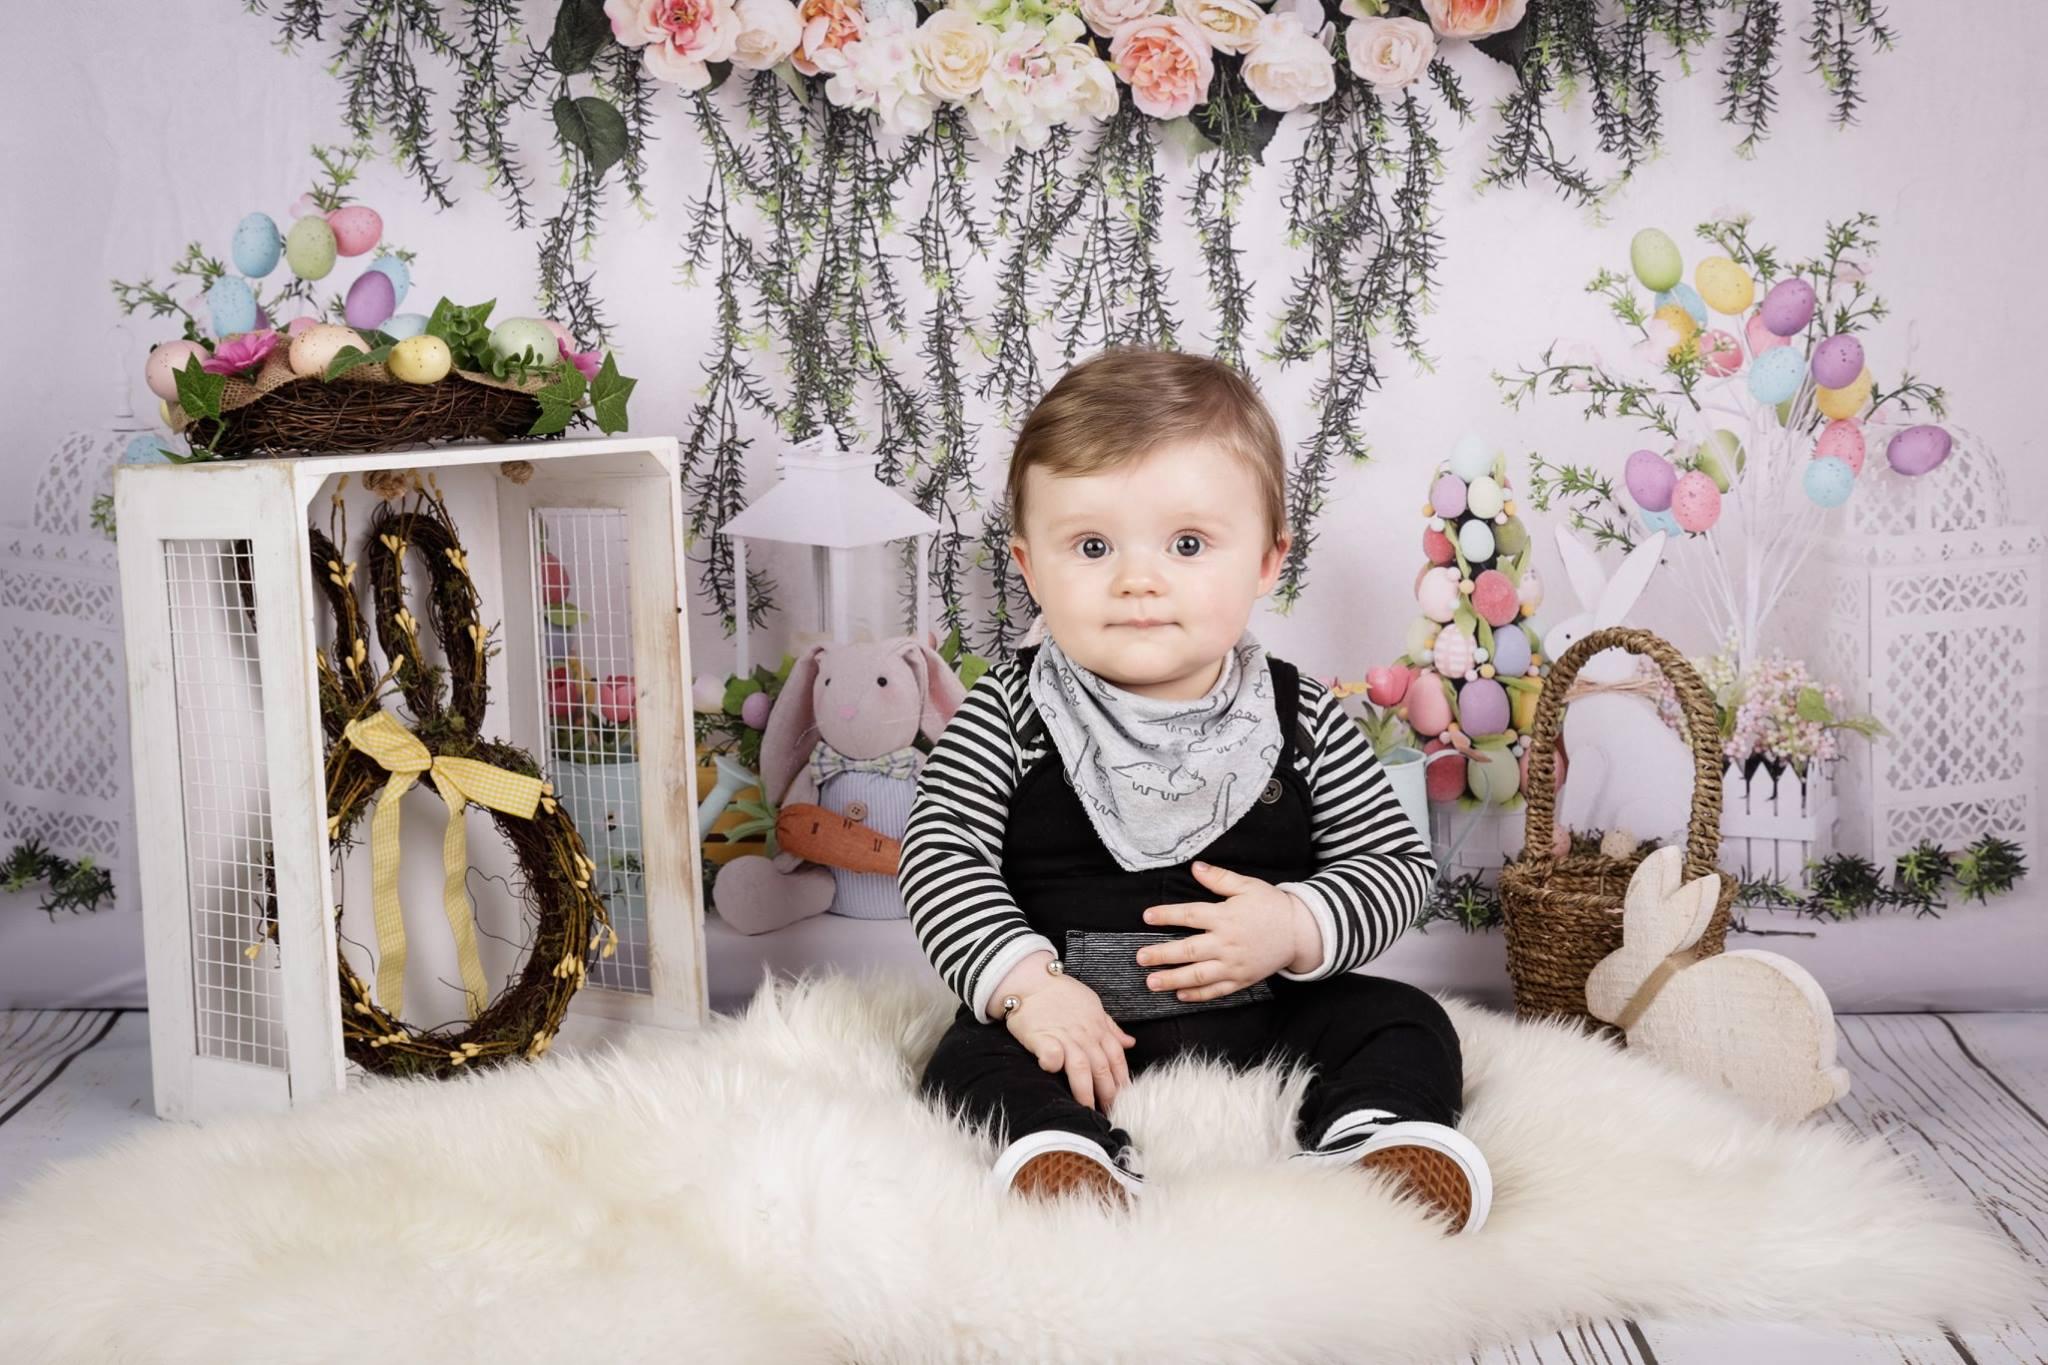 Easter pop up photography studio